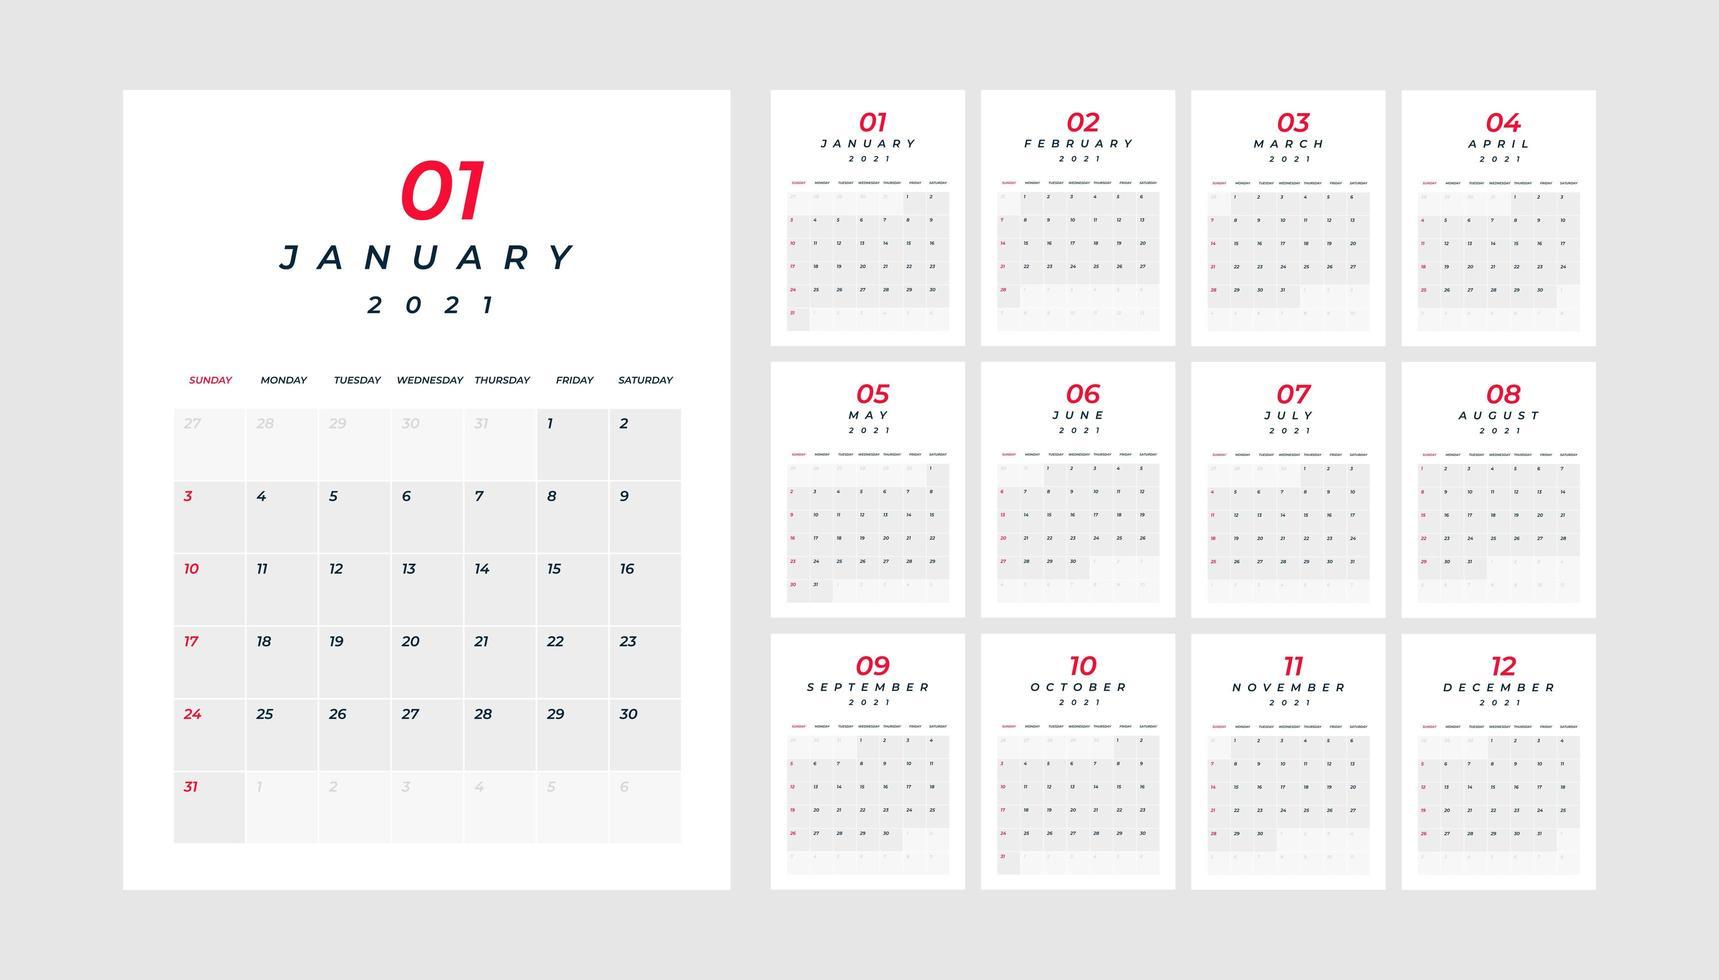 Kalender 2021, 12 Monate in sauberer Minimaltabelle vektor